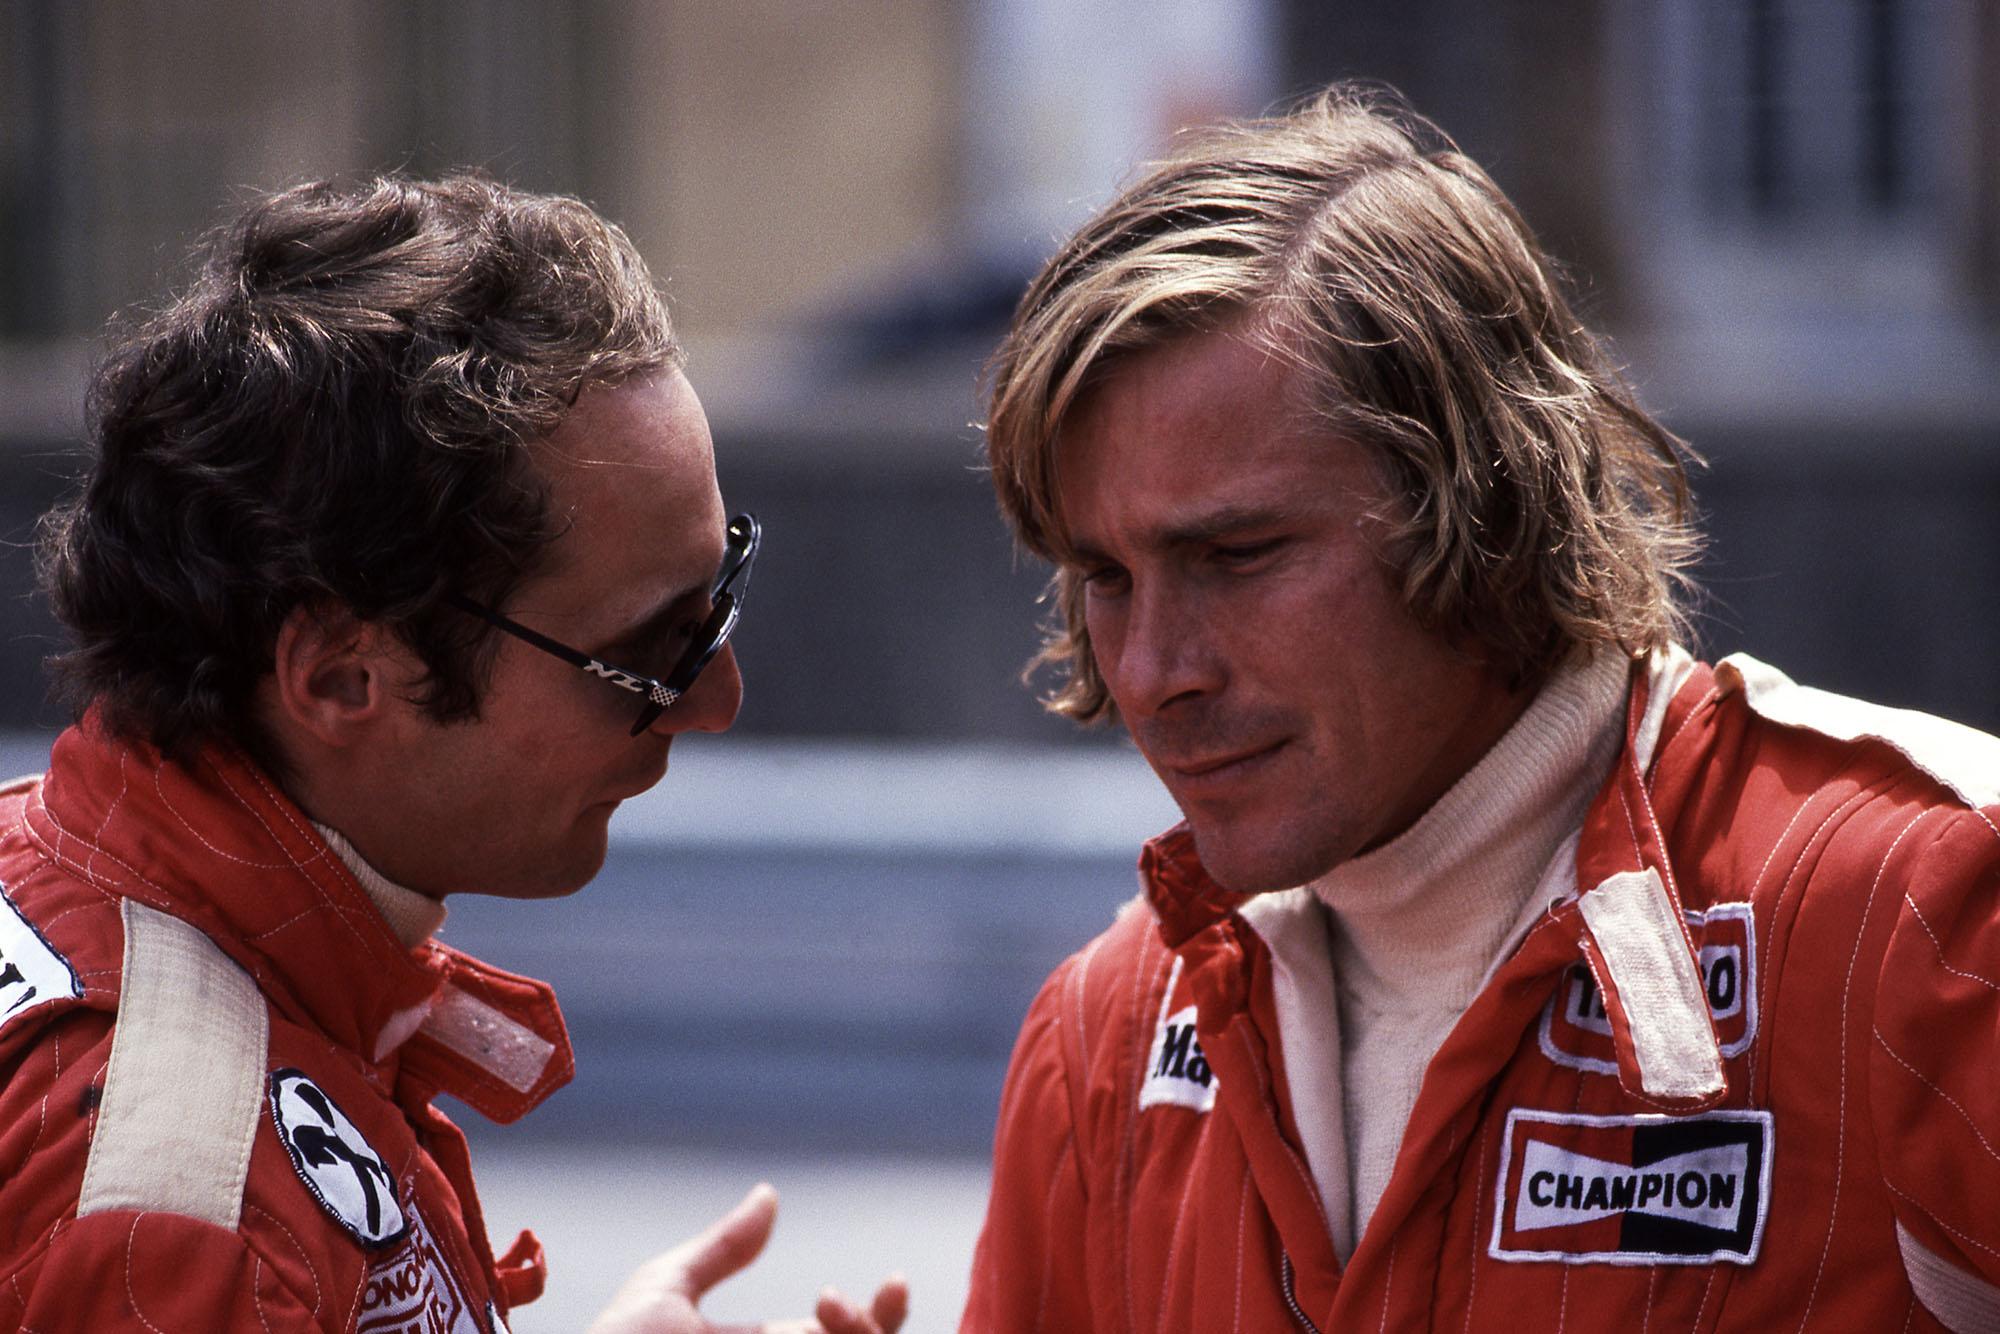 Niki Lauda (Ferrari) talks to James Hunt (McLaren) at the 1976 Monaco Grand Prix.